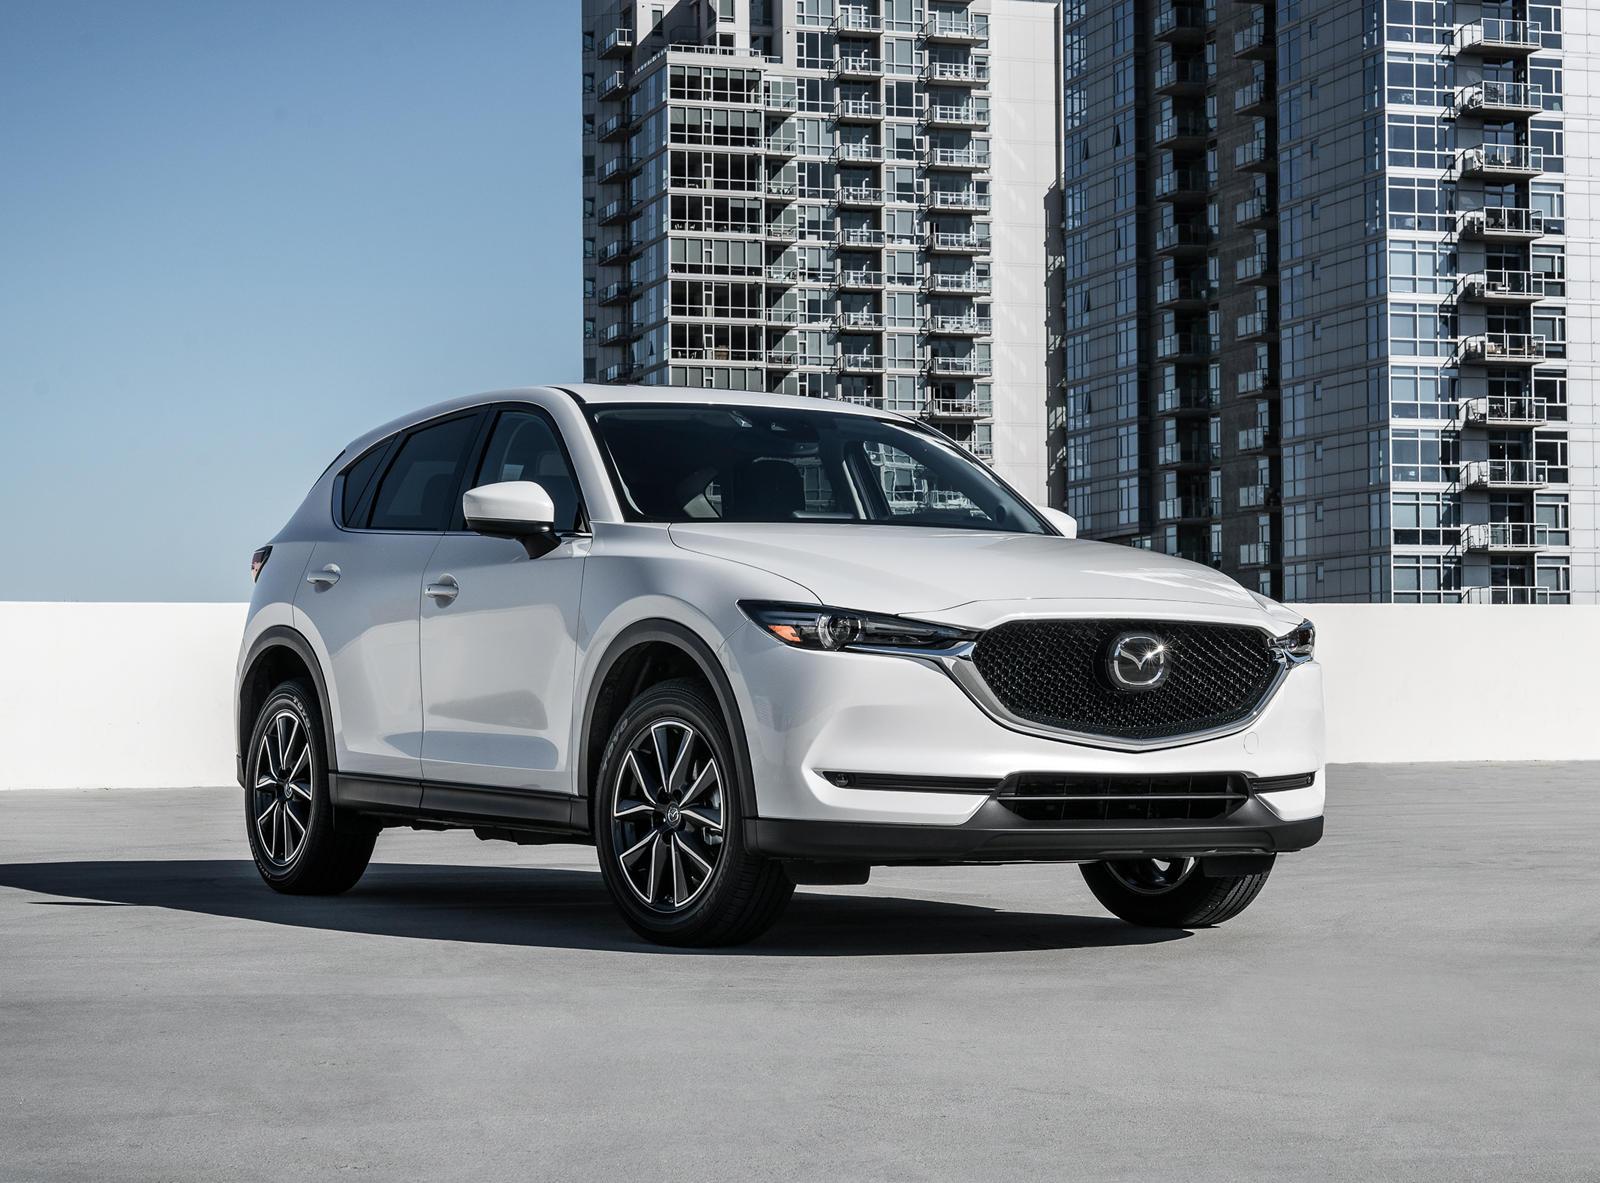 Kelebihan Mazda Cx 2019 Top Model Tahun Ini